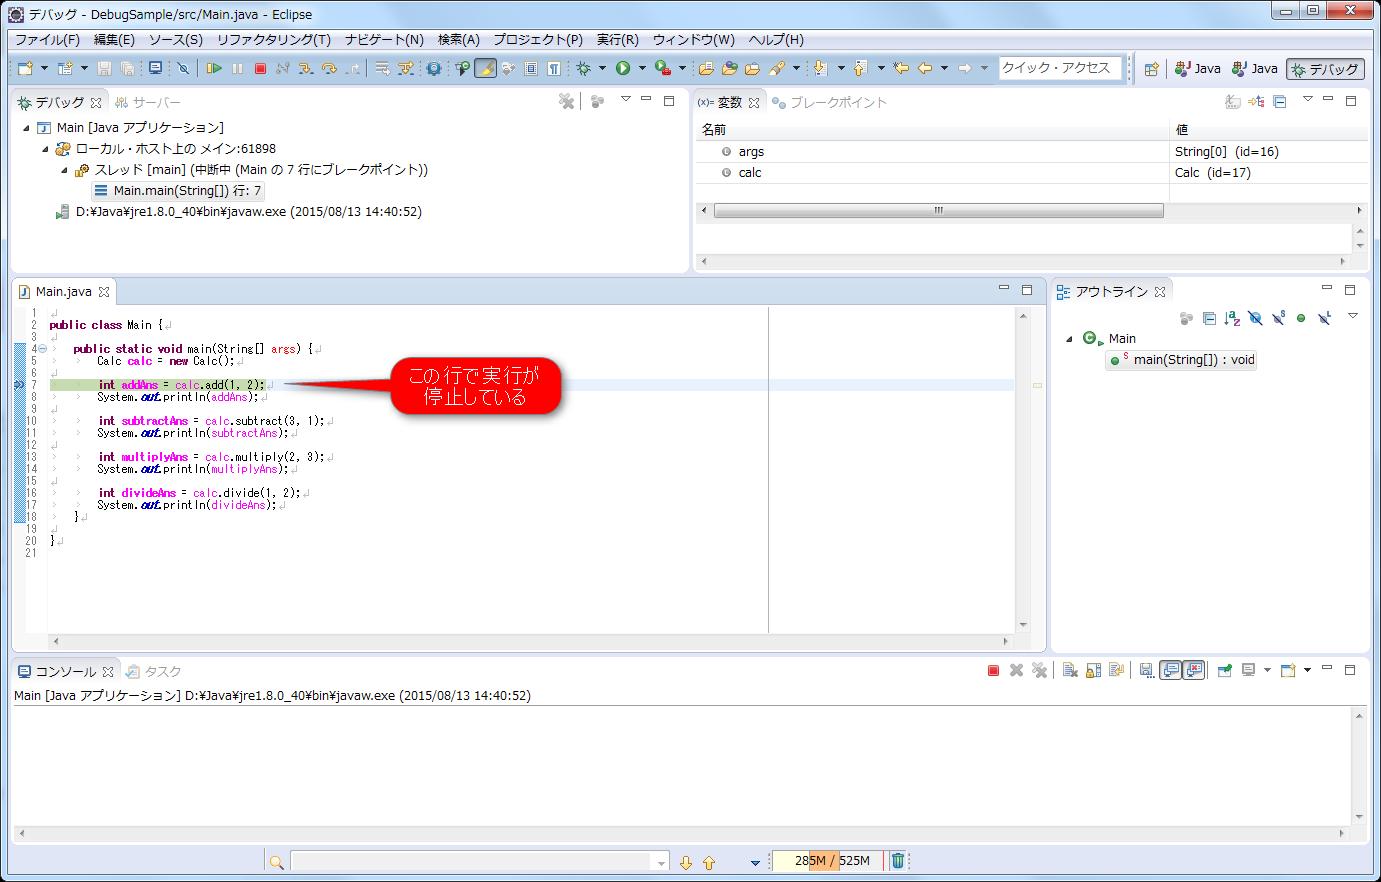 Eclipse Javaデバッグ実行